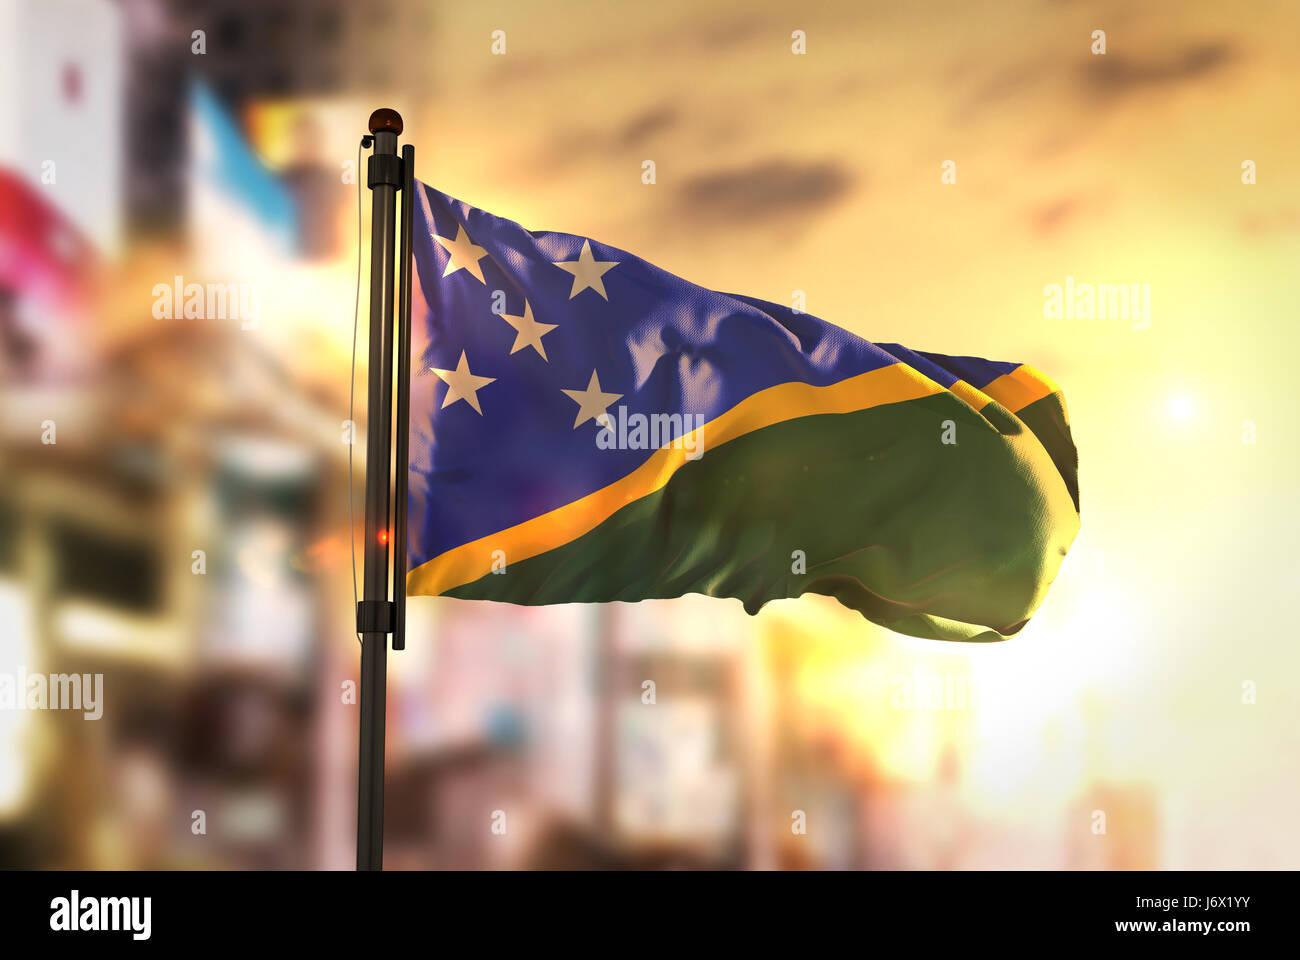 Solomon Islands Flag Against City Blurred Background At Sunrise Backlight - Stock Image